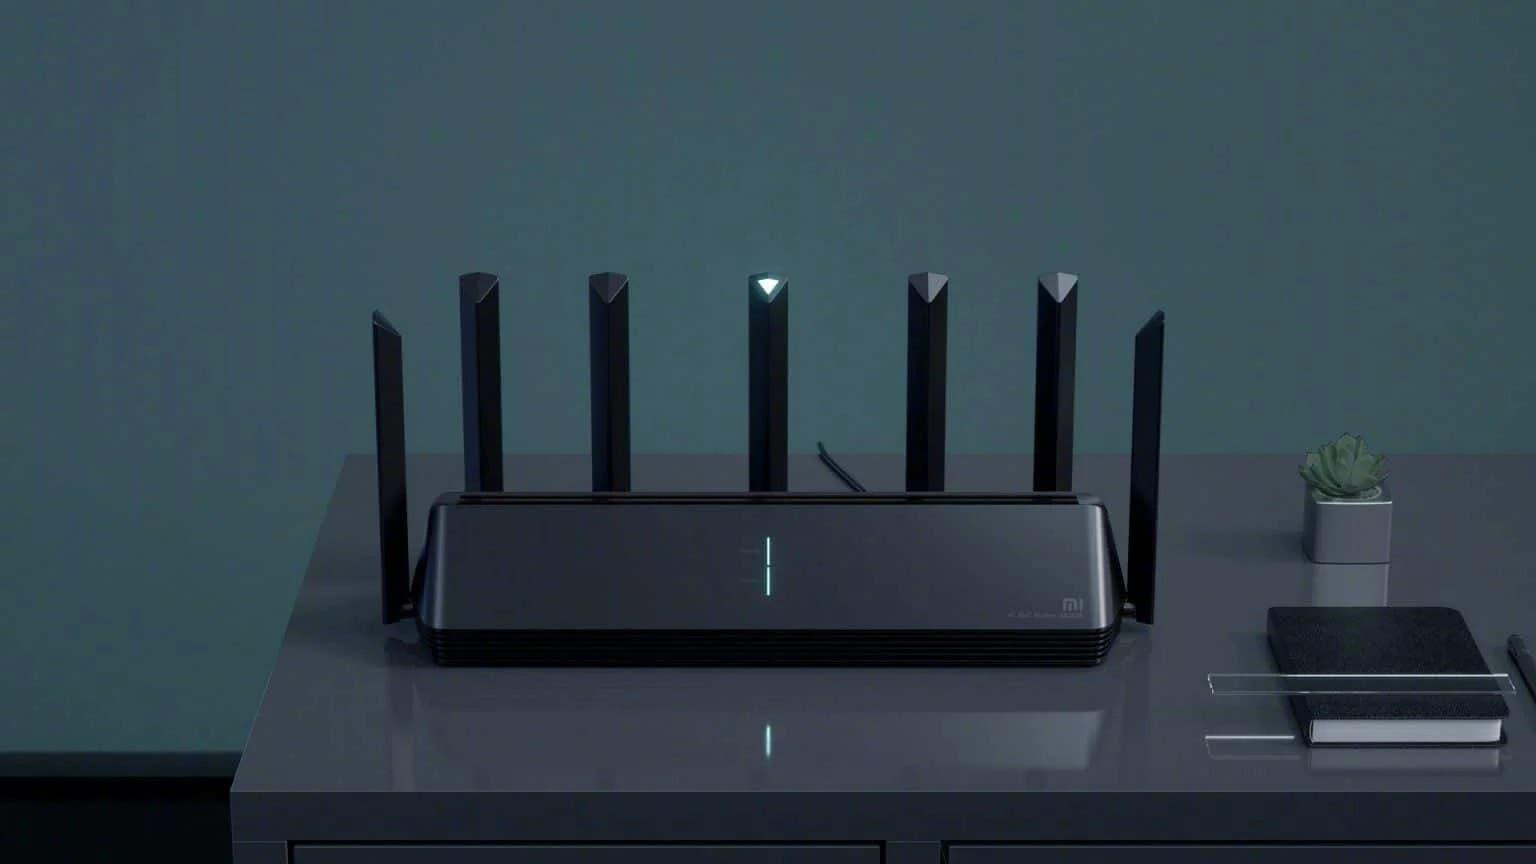 Xiaomi AIoT AX3600 WiFi 6 router